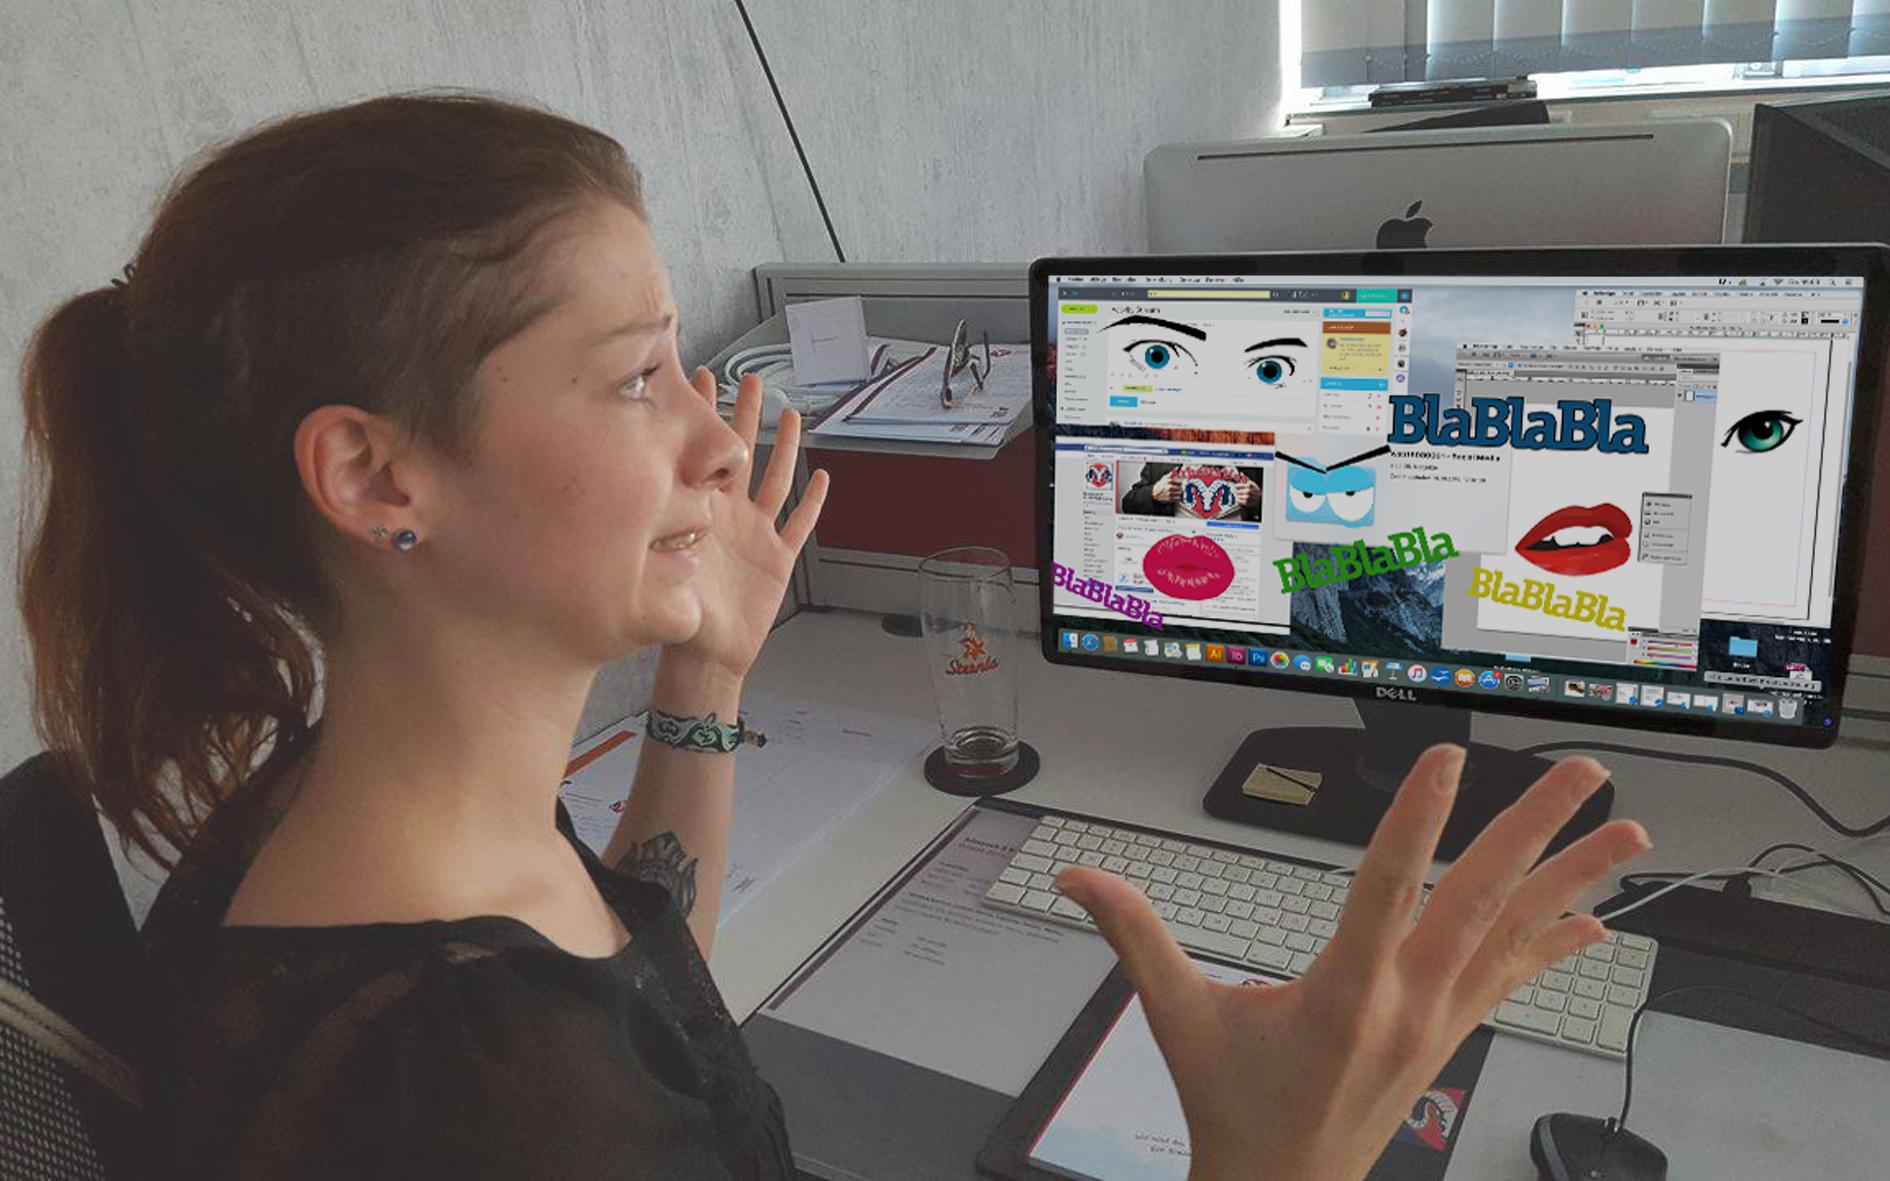 Praktikantin, Lauterbach Kreativbetreuung, Marketing, Kreativ, Agentur, Social Media, Consulting, Kommunikationsagentur, Gestaltung